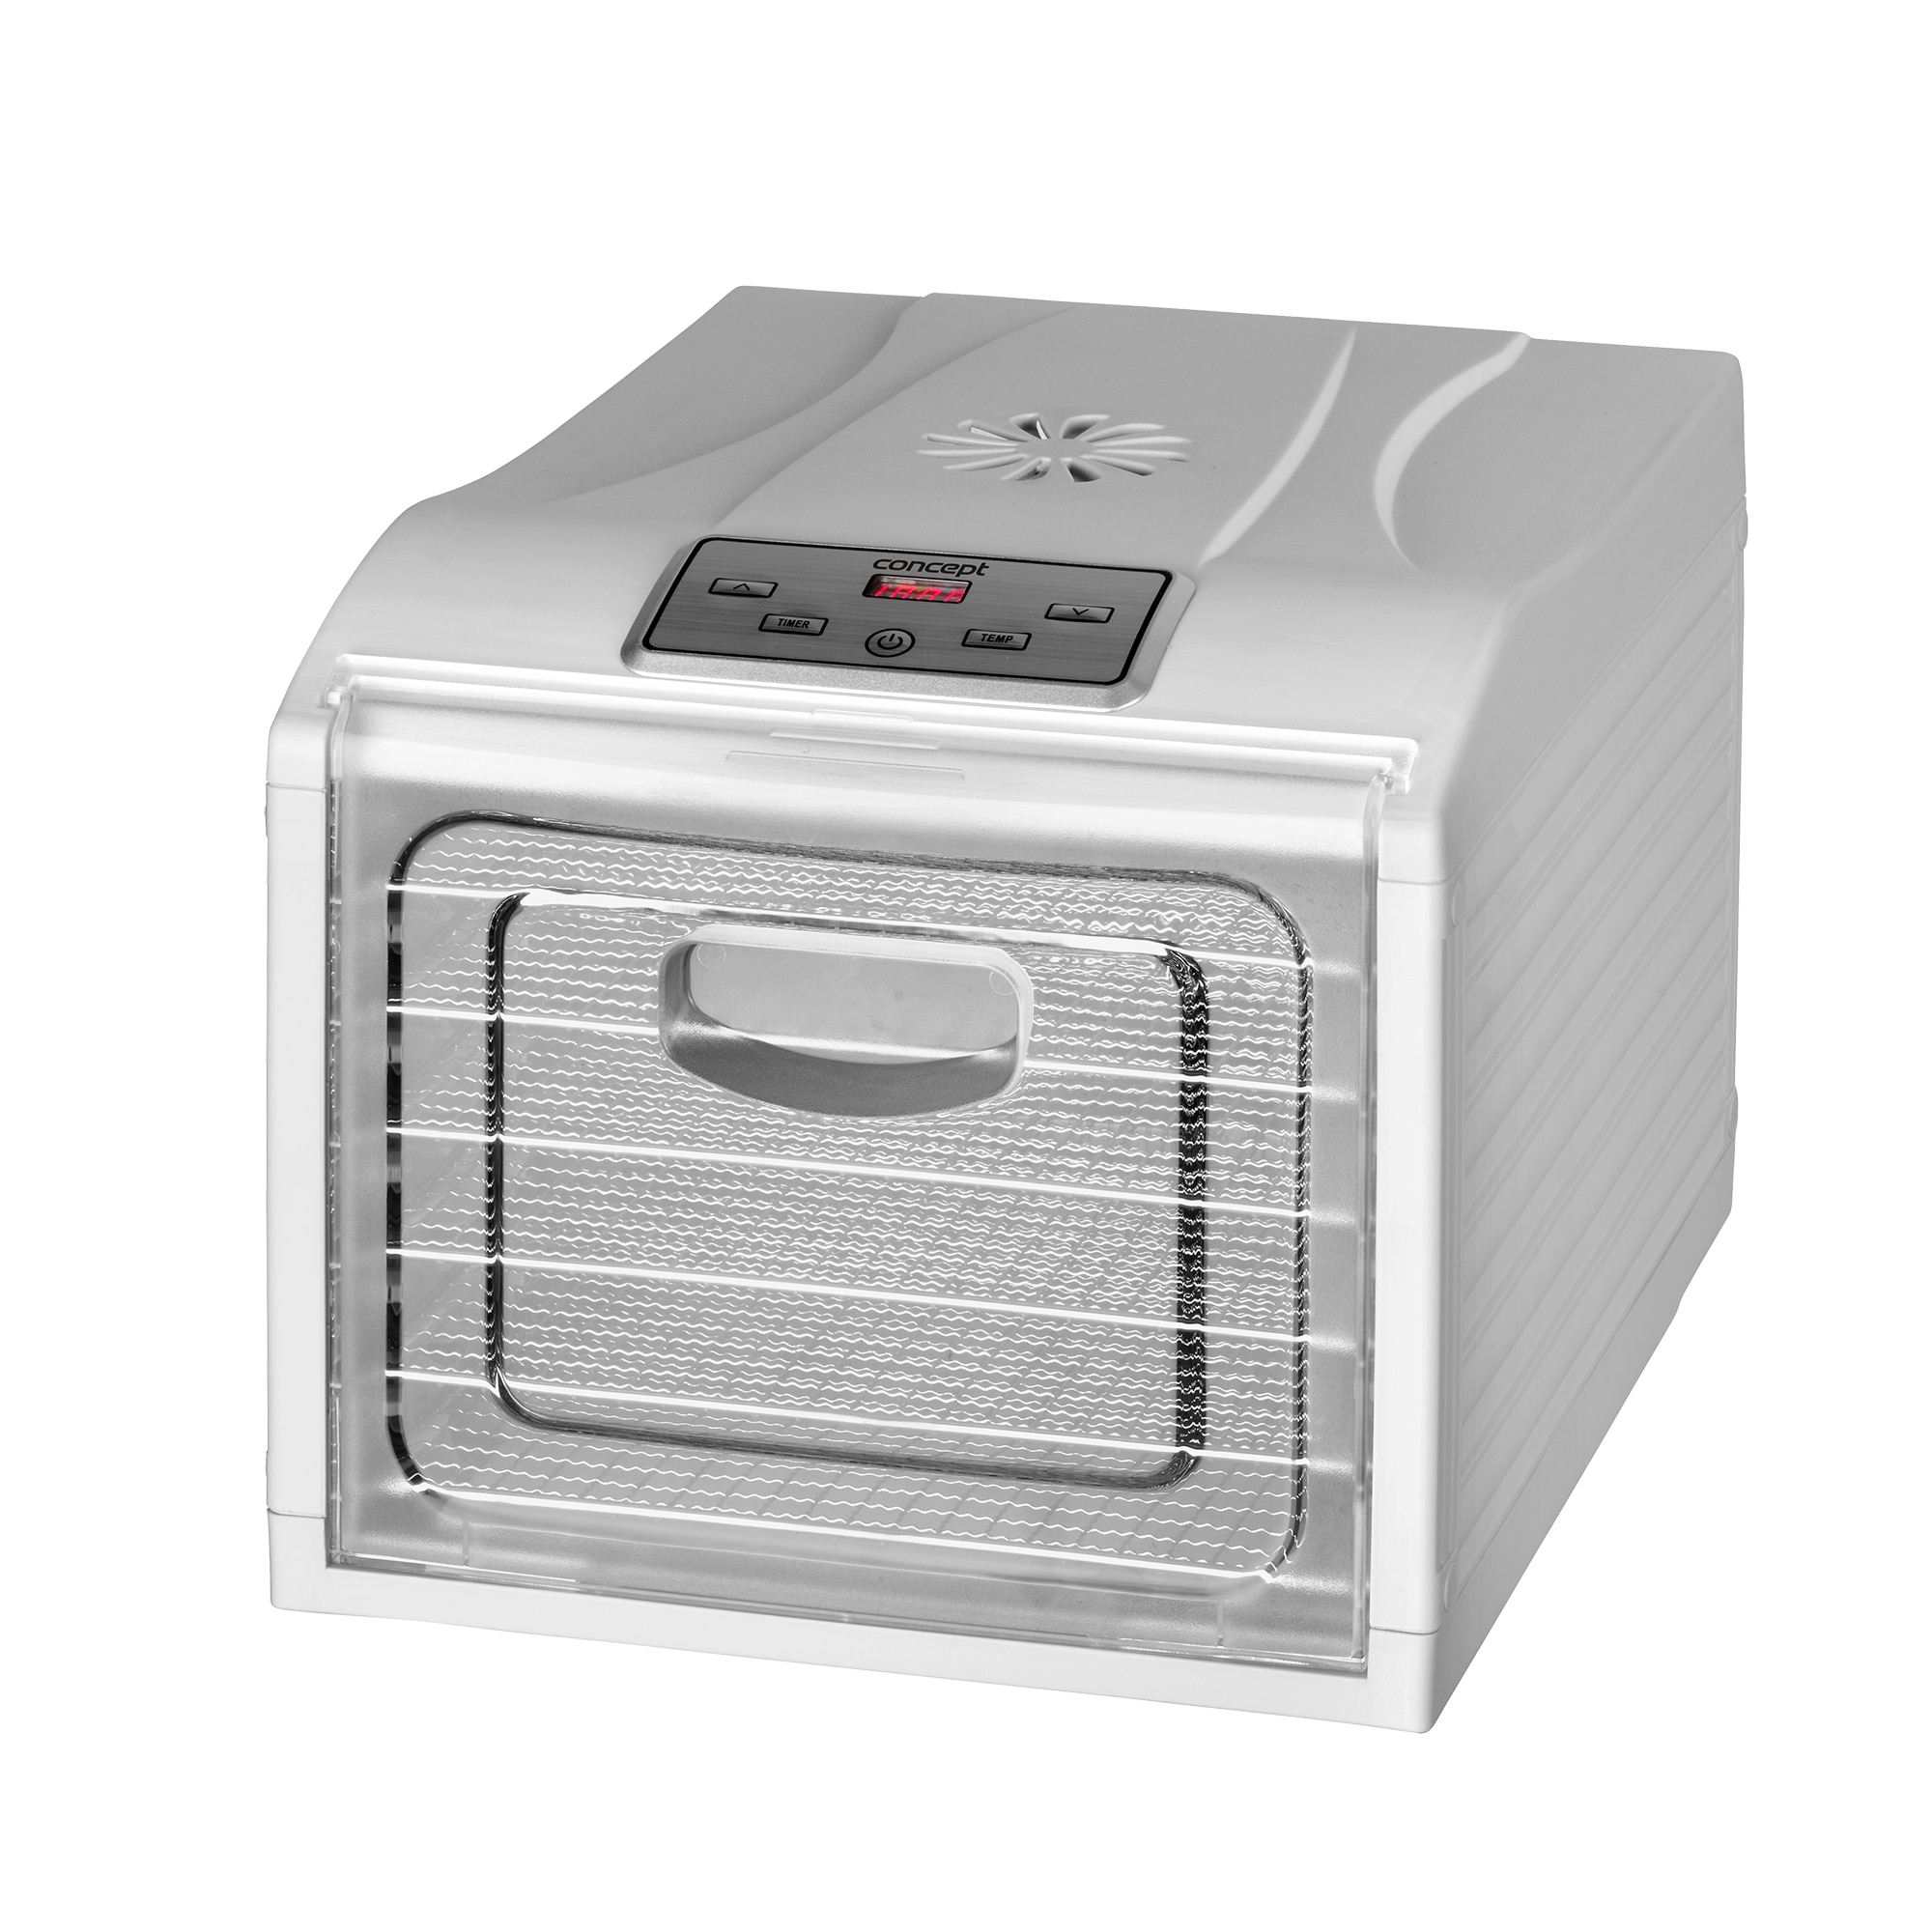 Fotografie Deshidrator de alimente Concept SO2050, 500 W, 6 tavi inox, 30 x 33 cm, timer, Alb